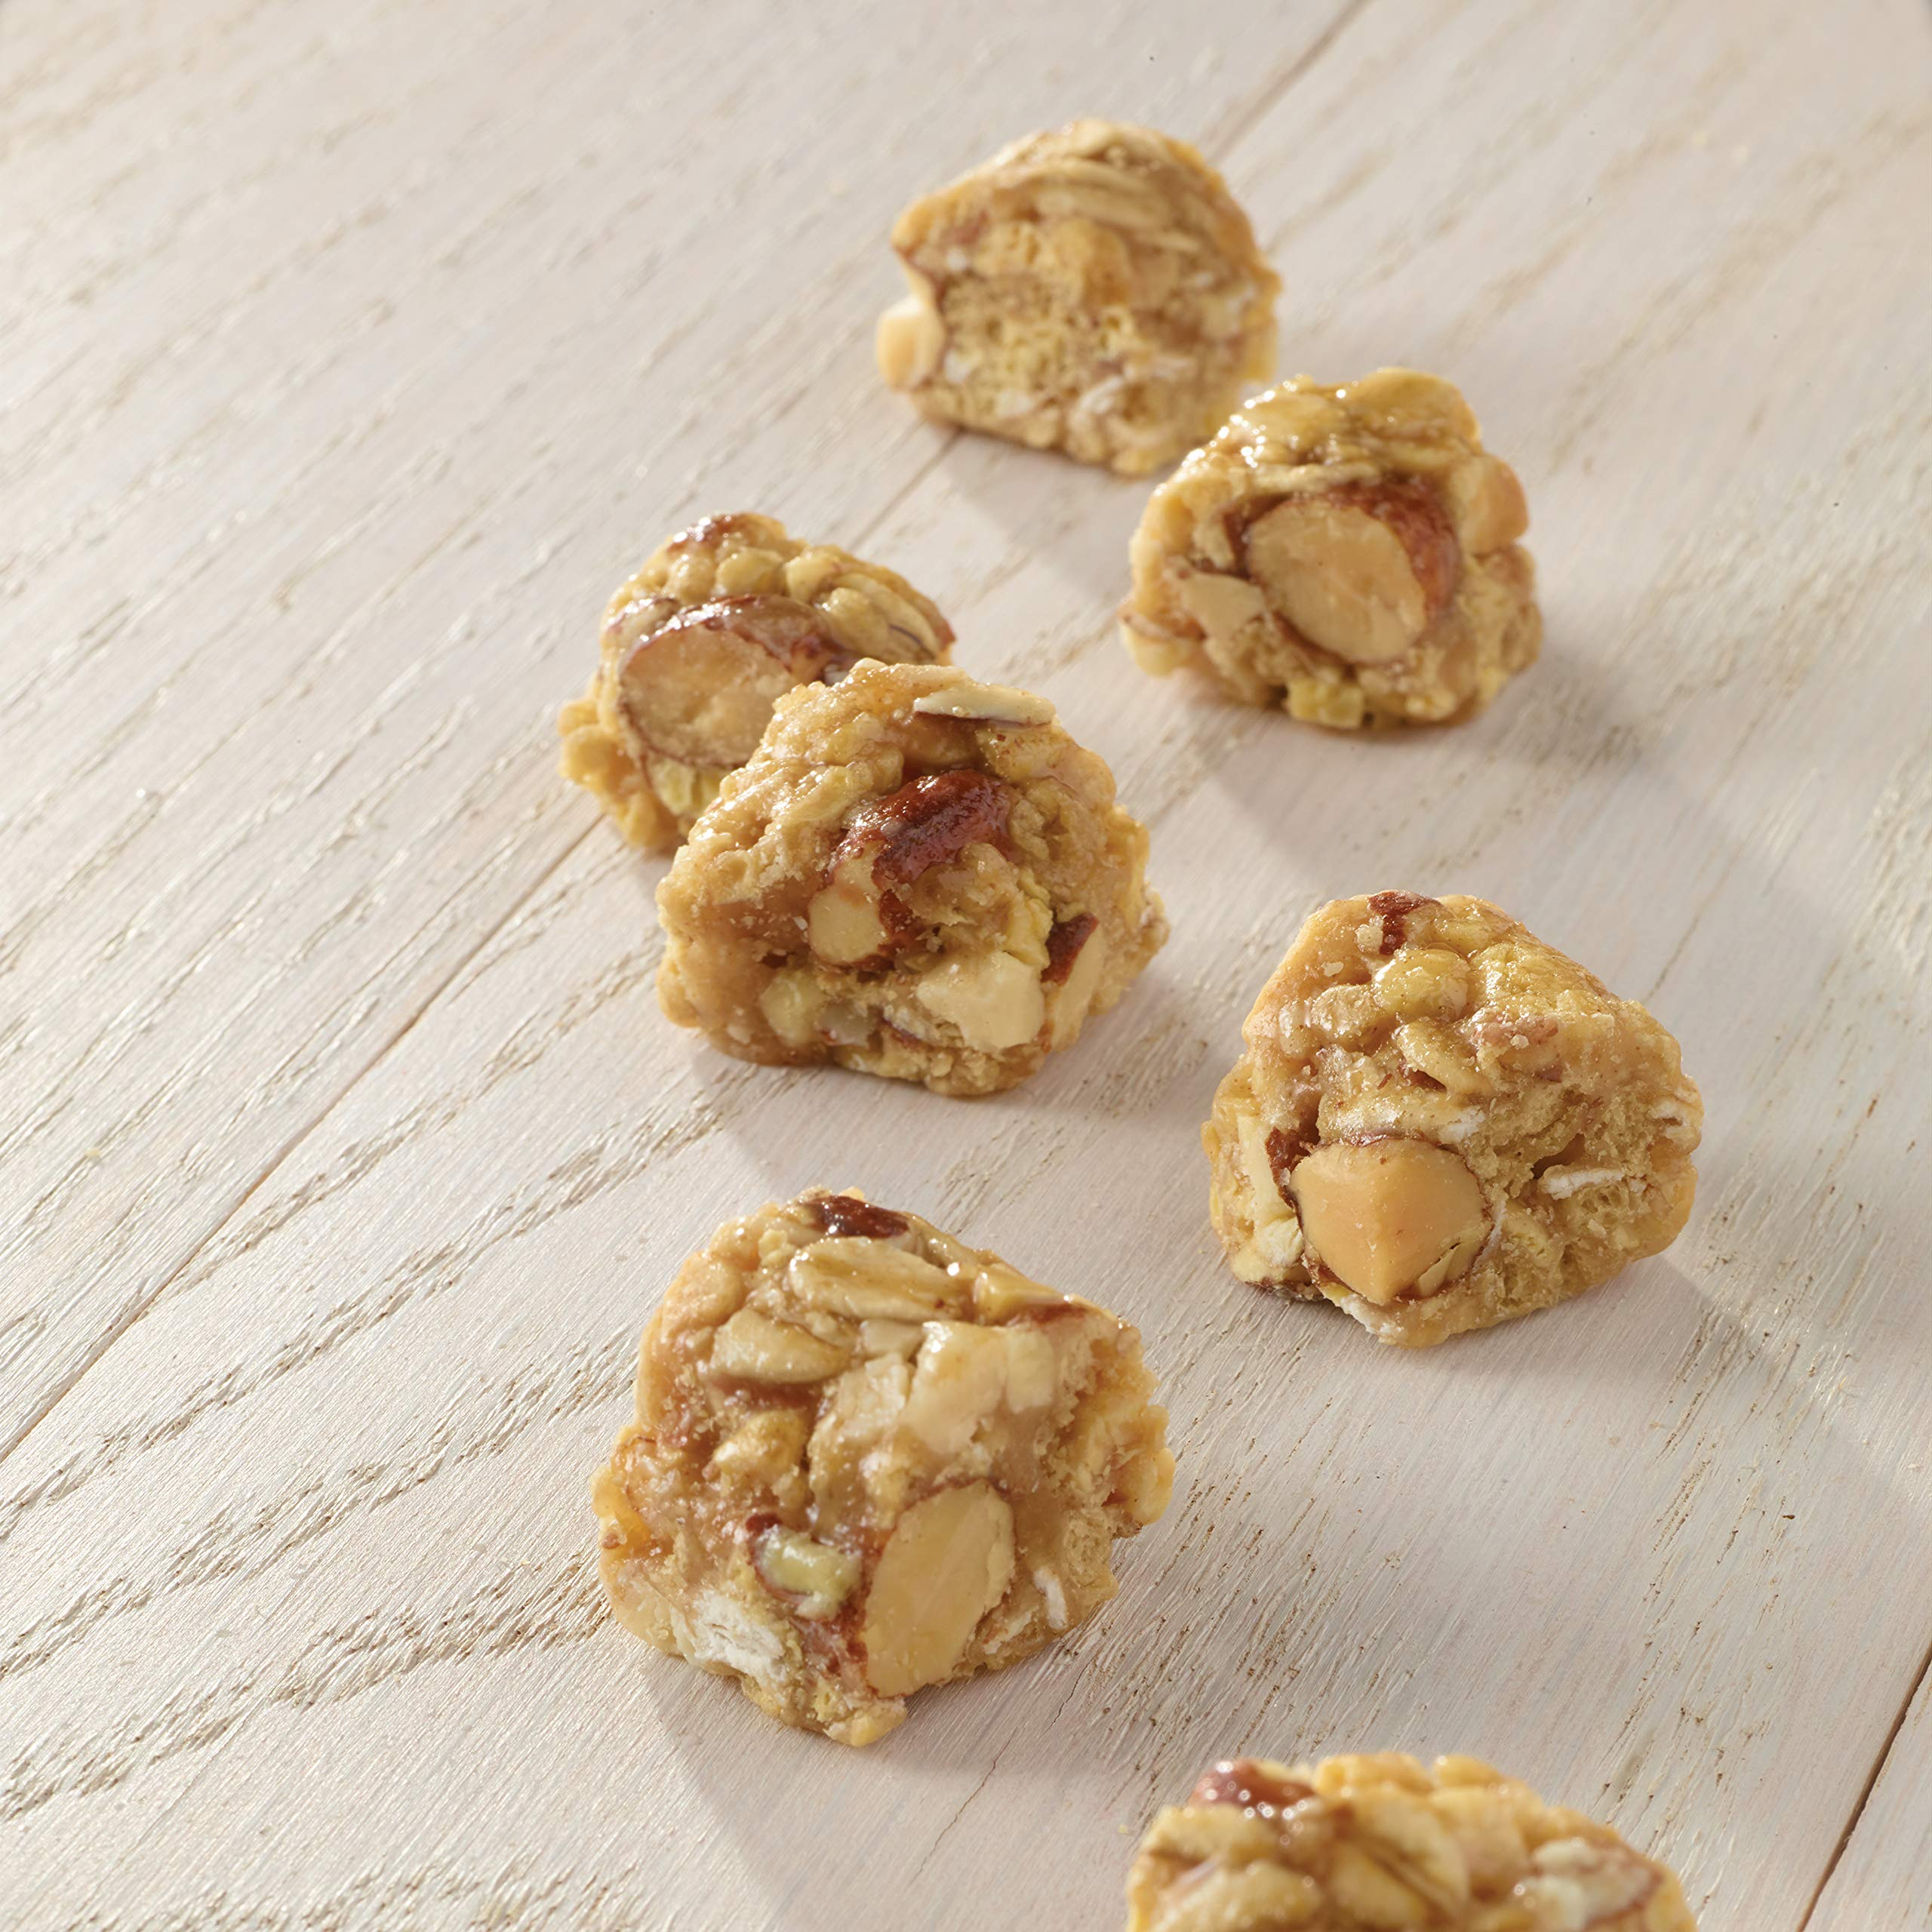 Bear Naked Peanut Butter & Honey Granola Bites - Gluten Free | Non-GMO | Kosher | Vegetarian Friendly - 7.2 Oz by Bear Naked (Image #5)